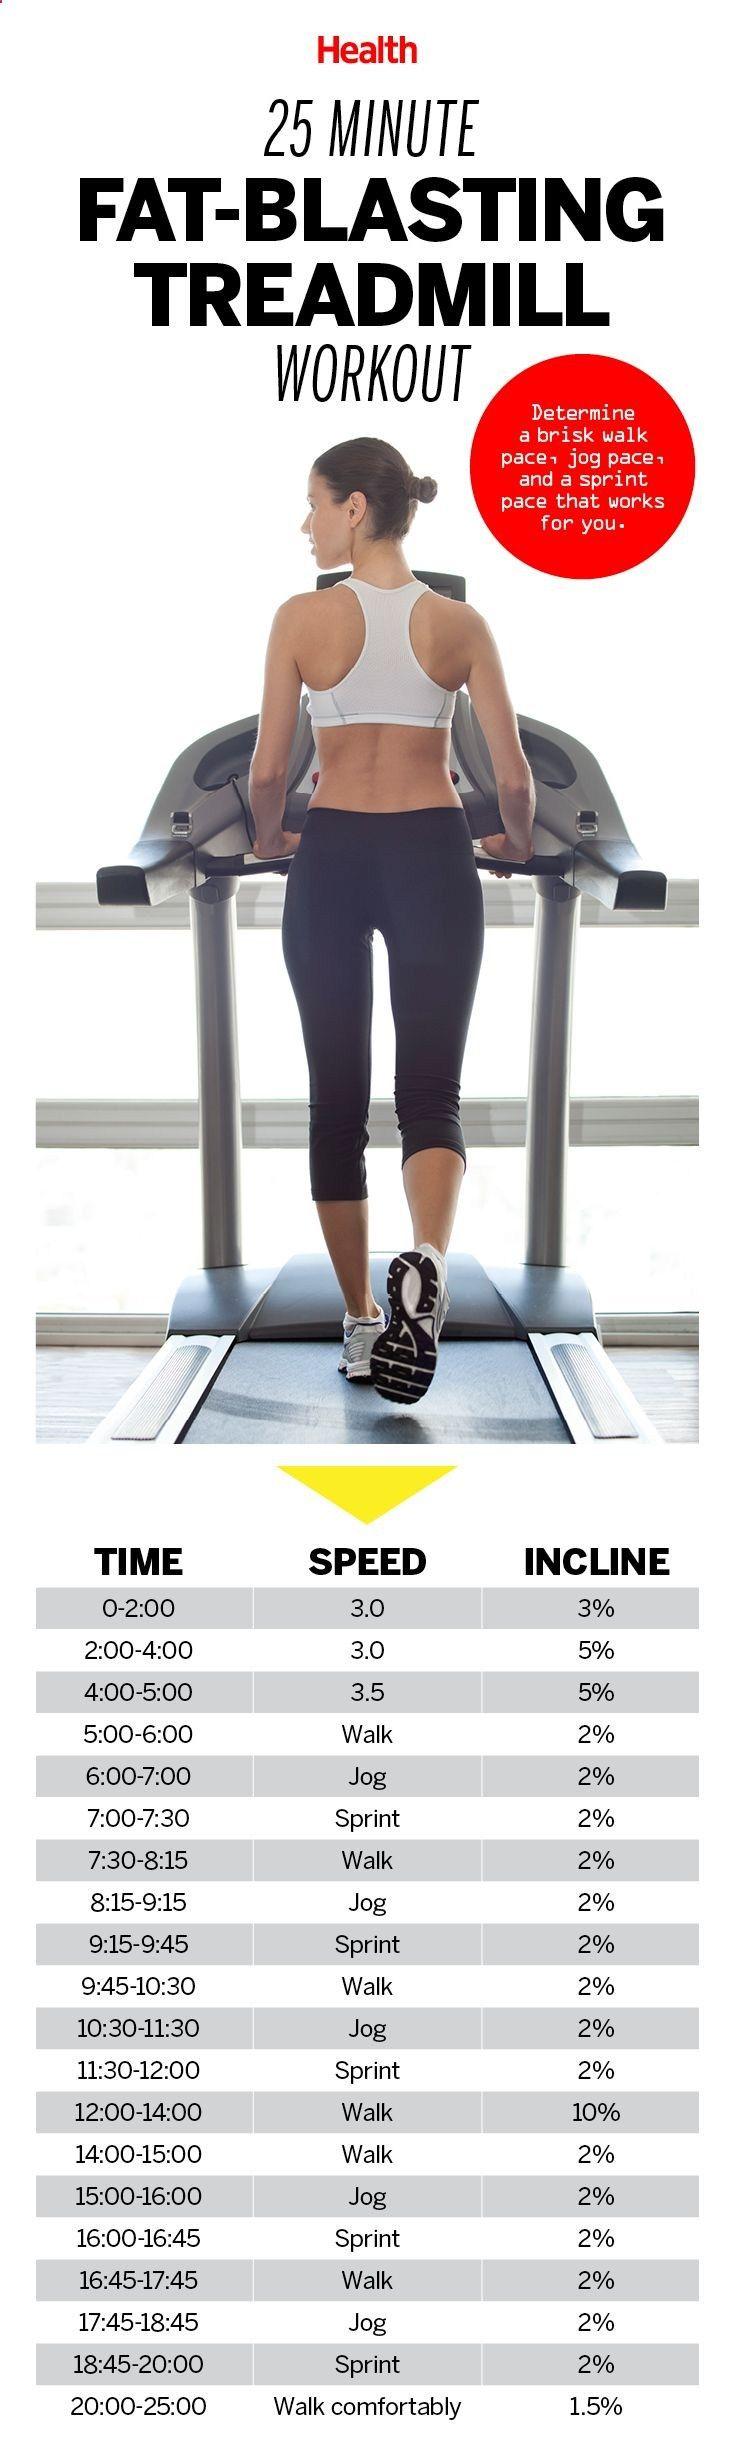 A Fat-Burning Treadmill Workout That's ActuallyFun